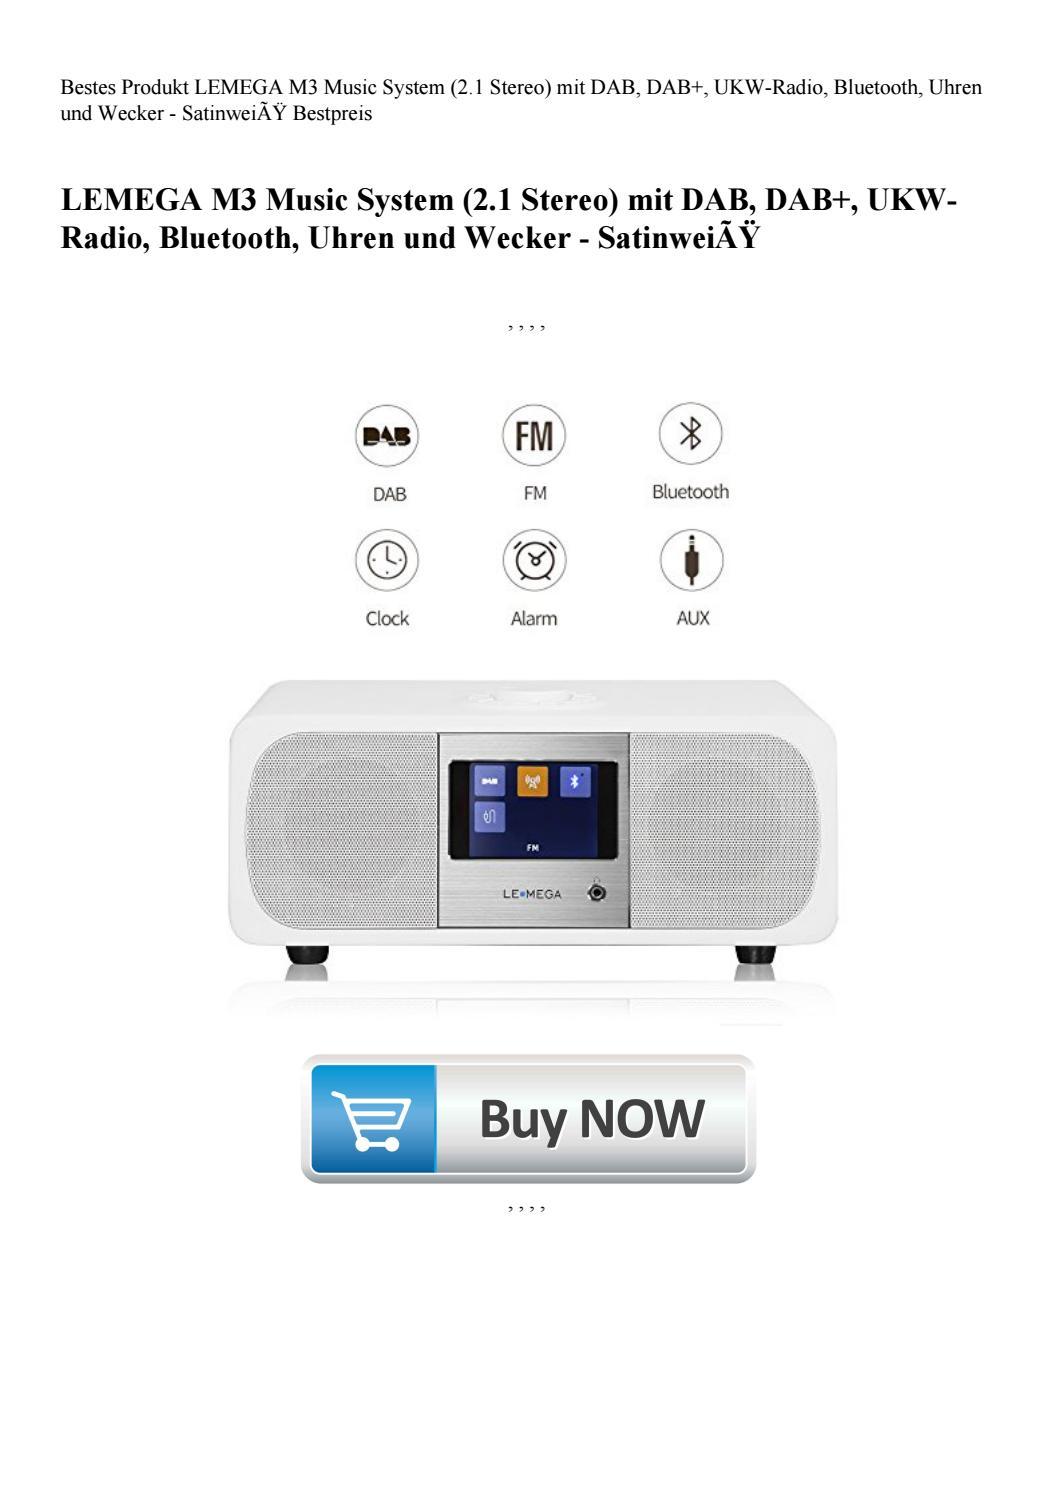 UKW-Radio LEMEGA M3 Music System Uhren 2.1 Stereo Bluetooth mit DAB DAB+